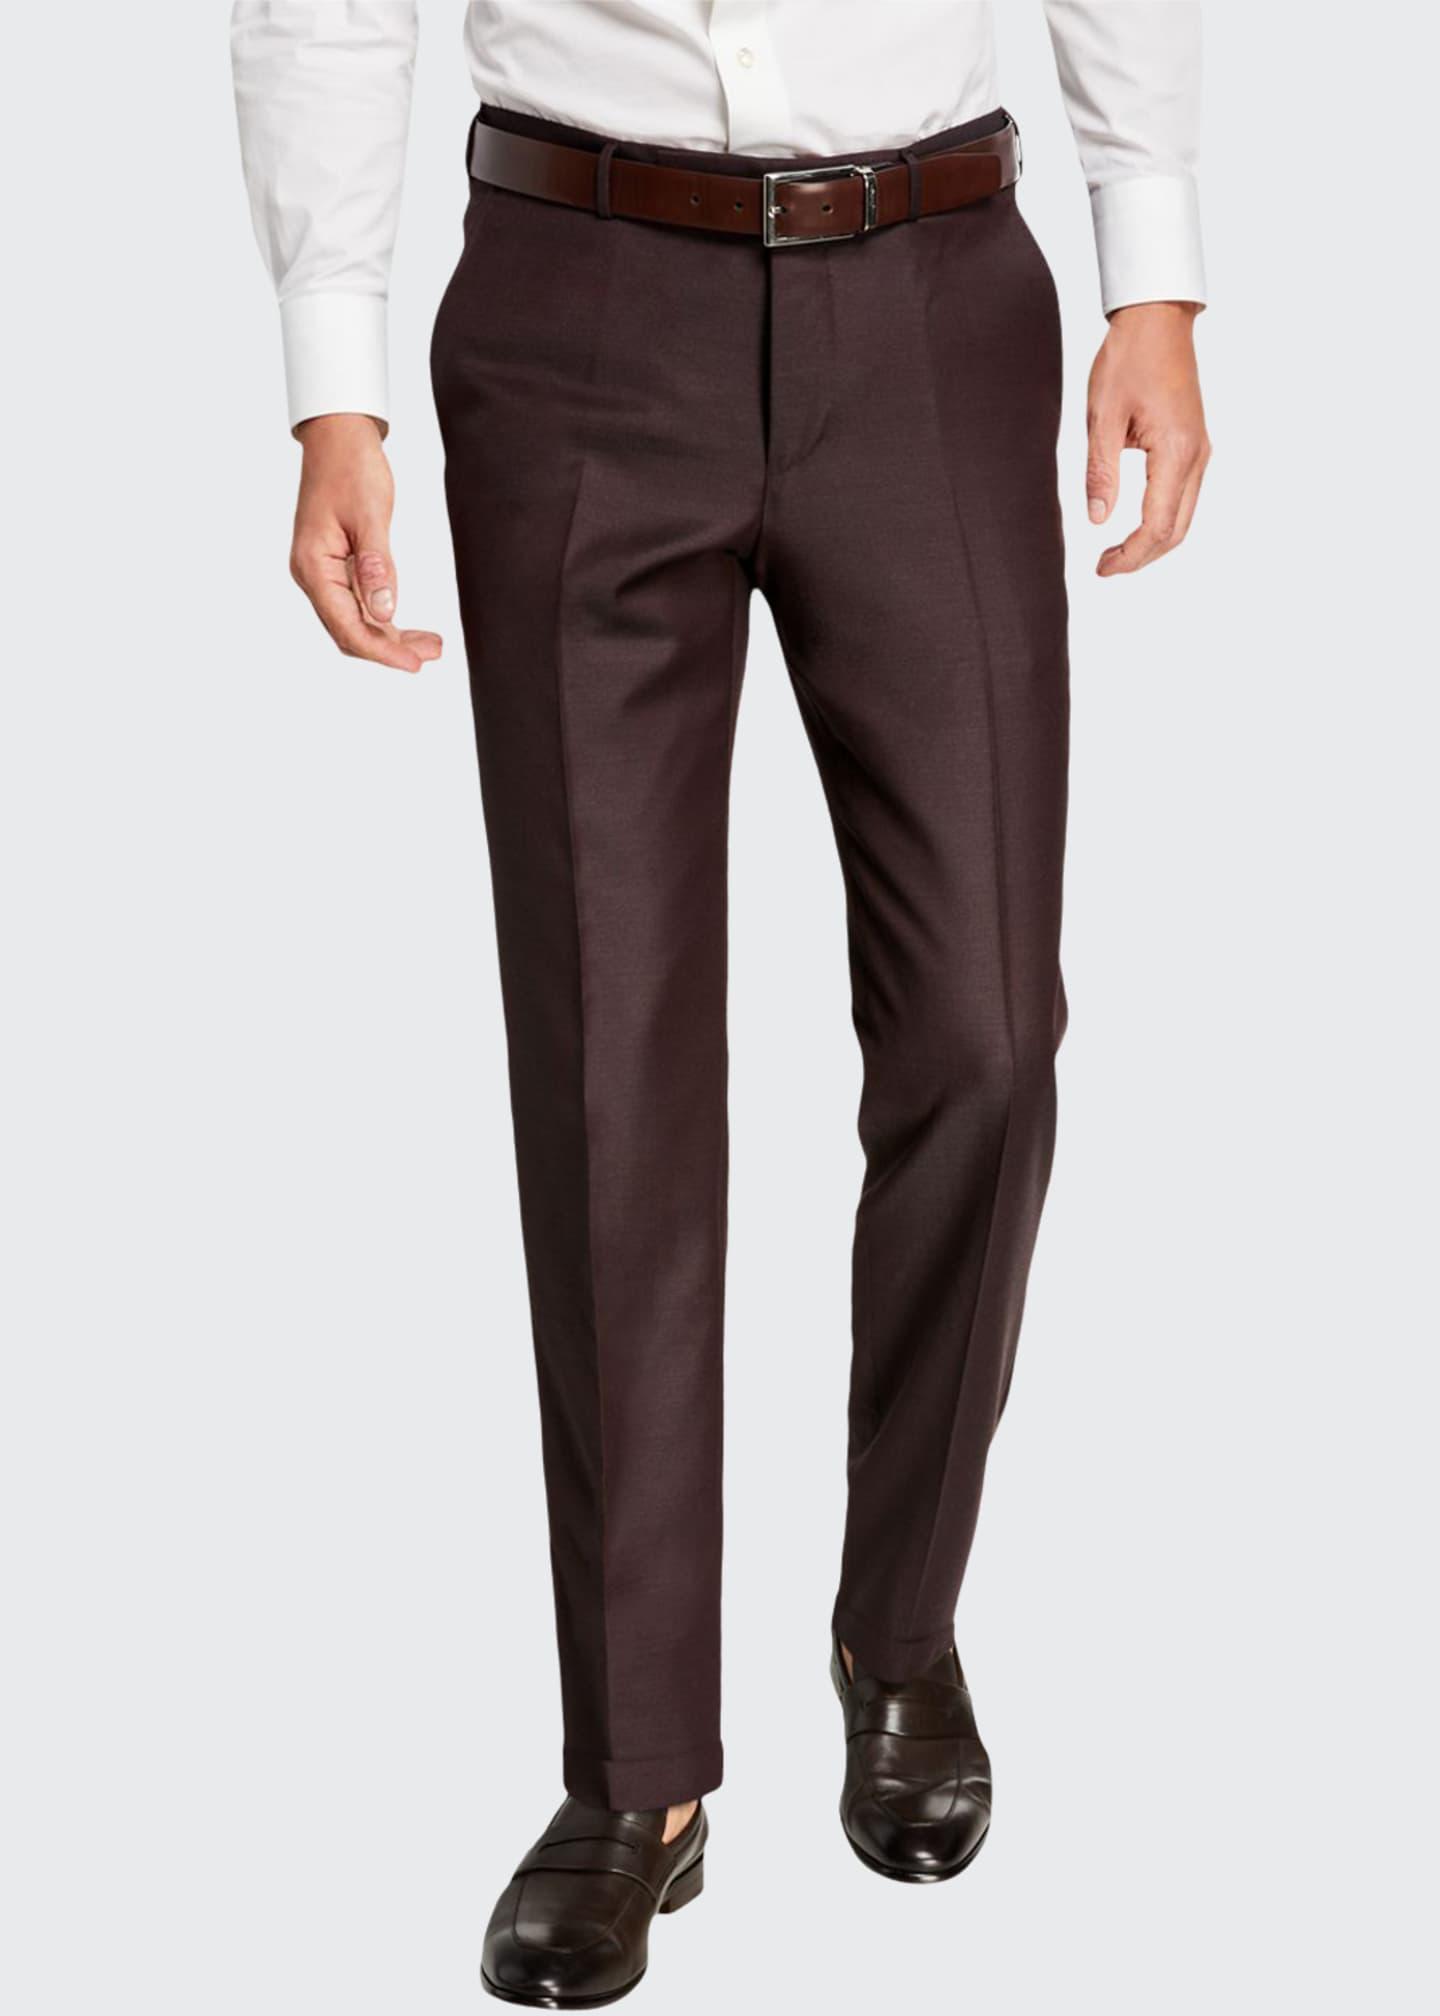 Ermenegildo Zegna Men's Achillfarm Twill Flat-Front Trousers